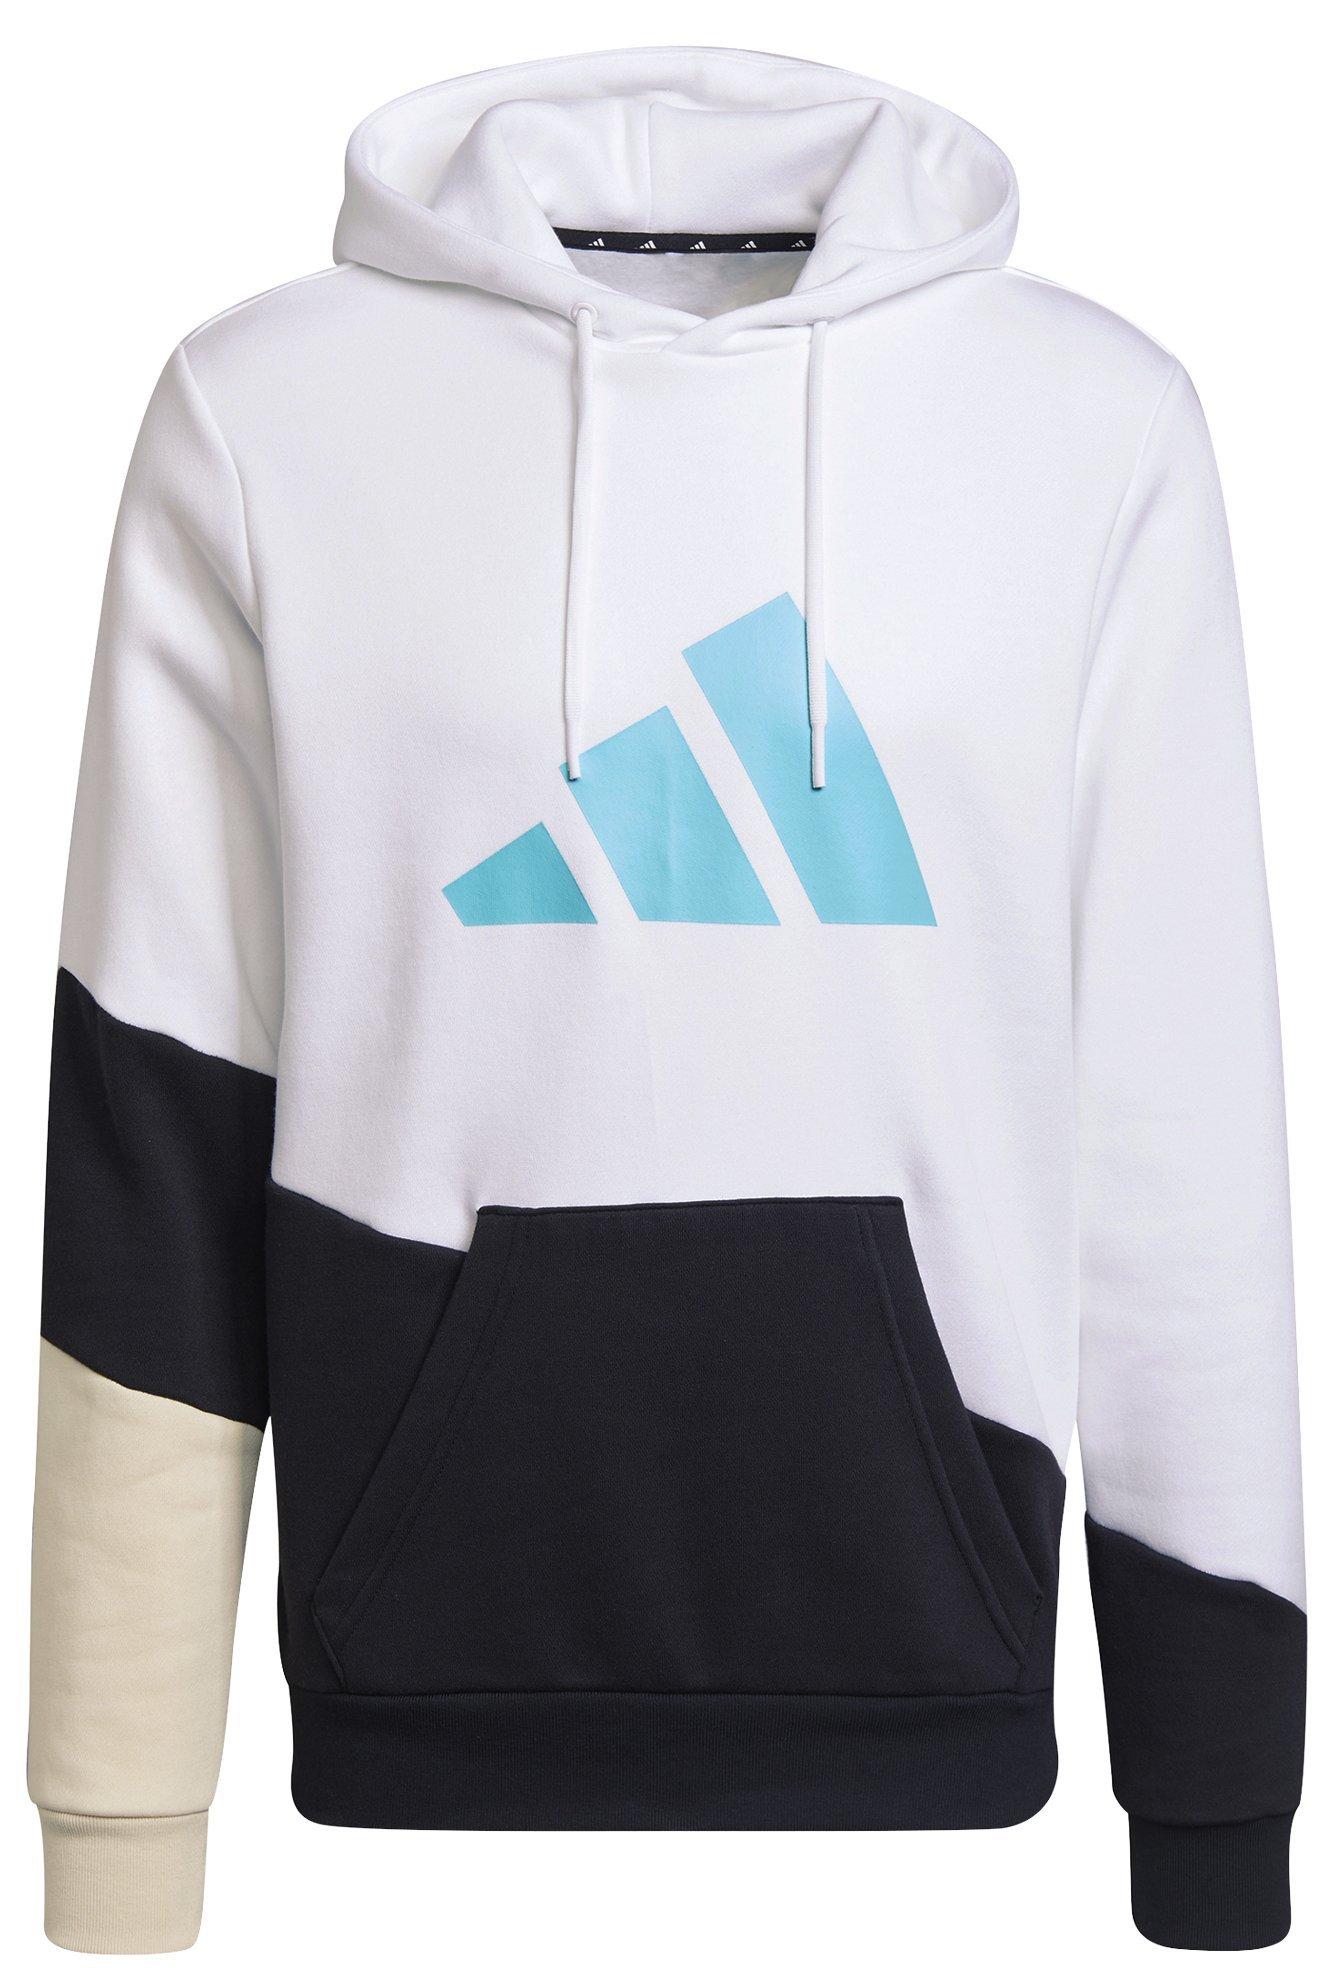 Levně Adidas M FI CB OH XL